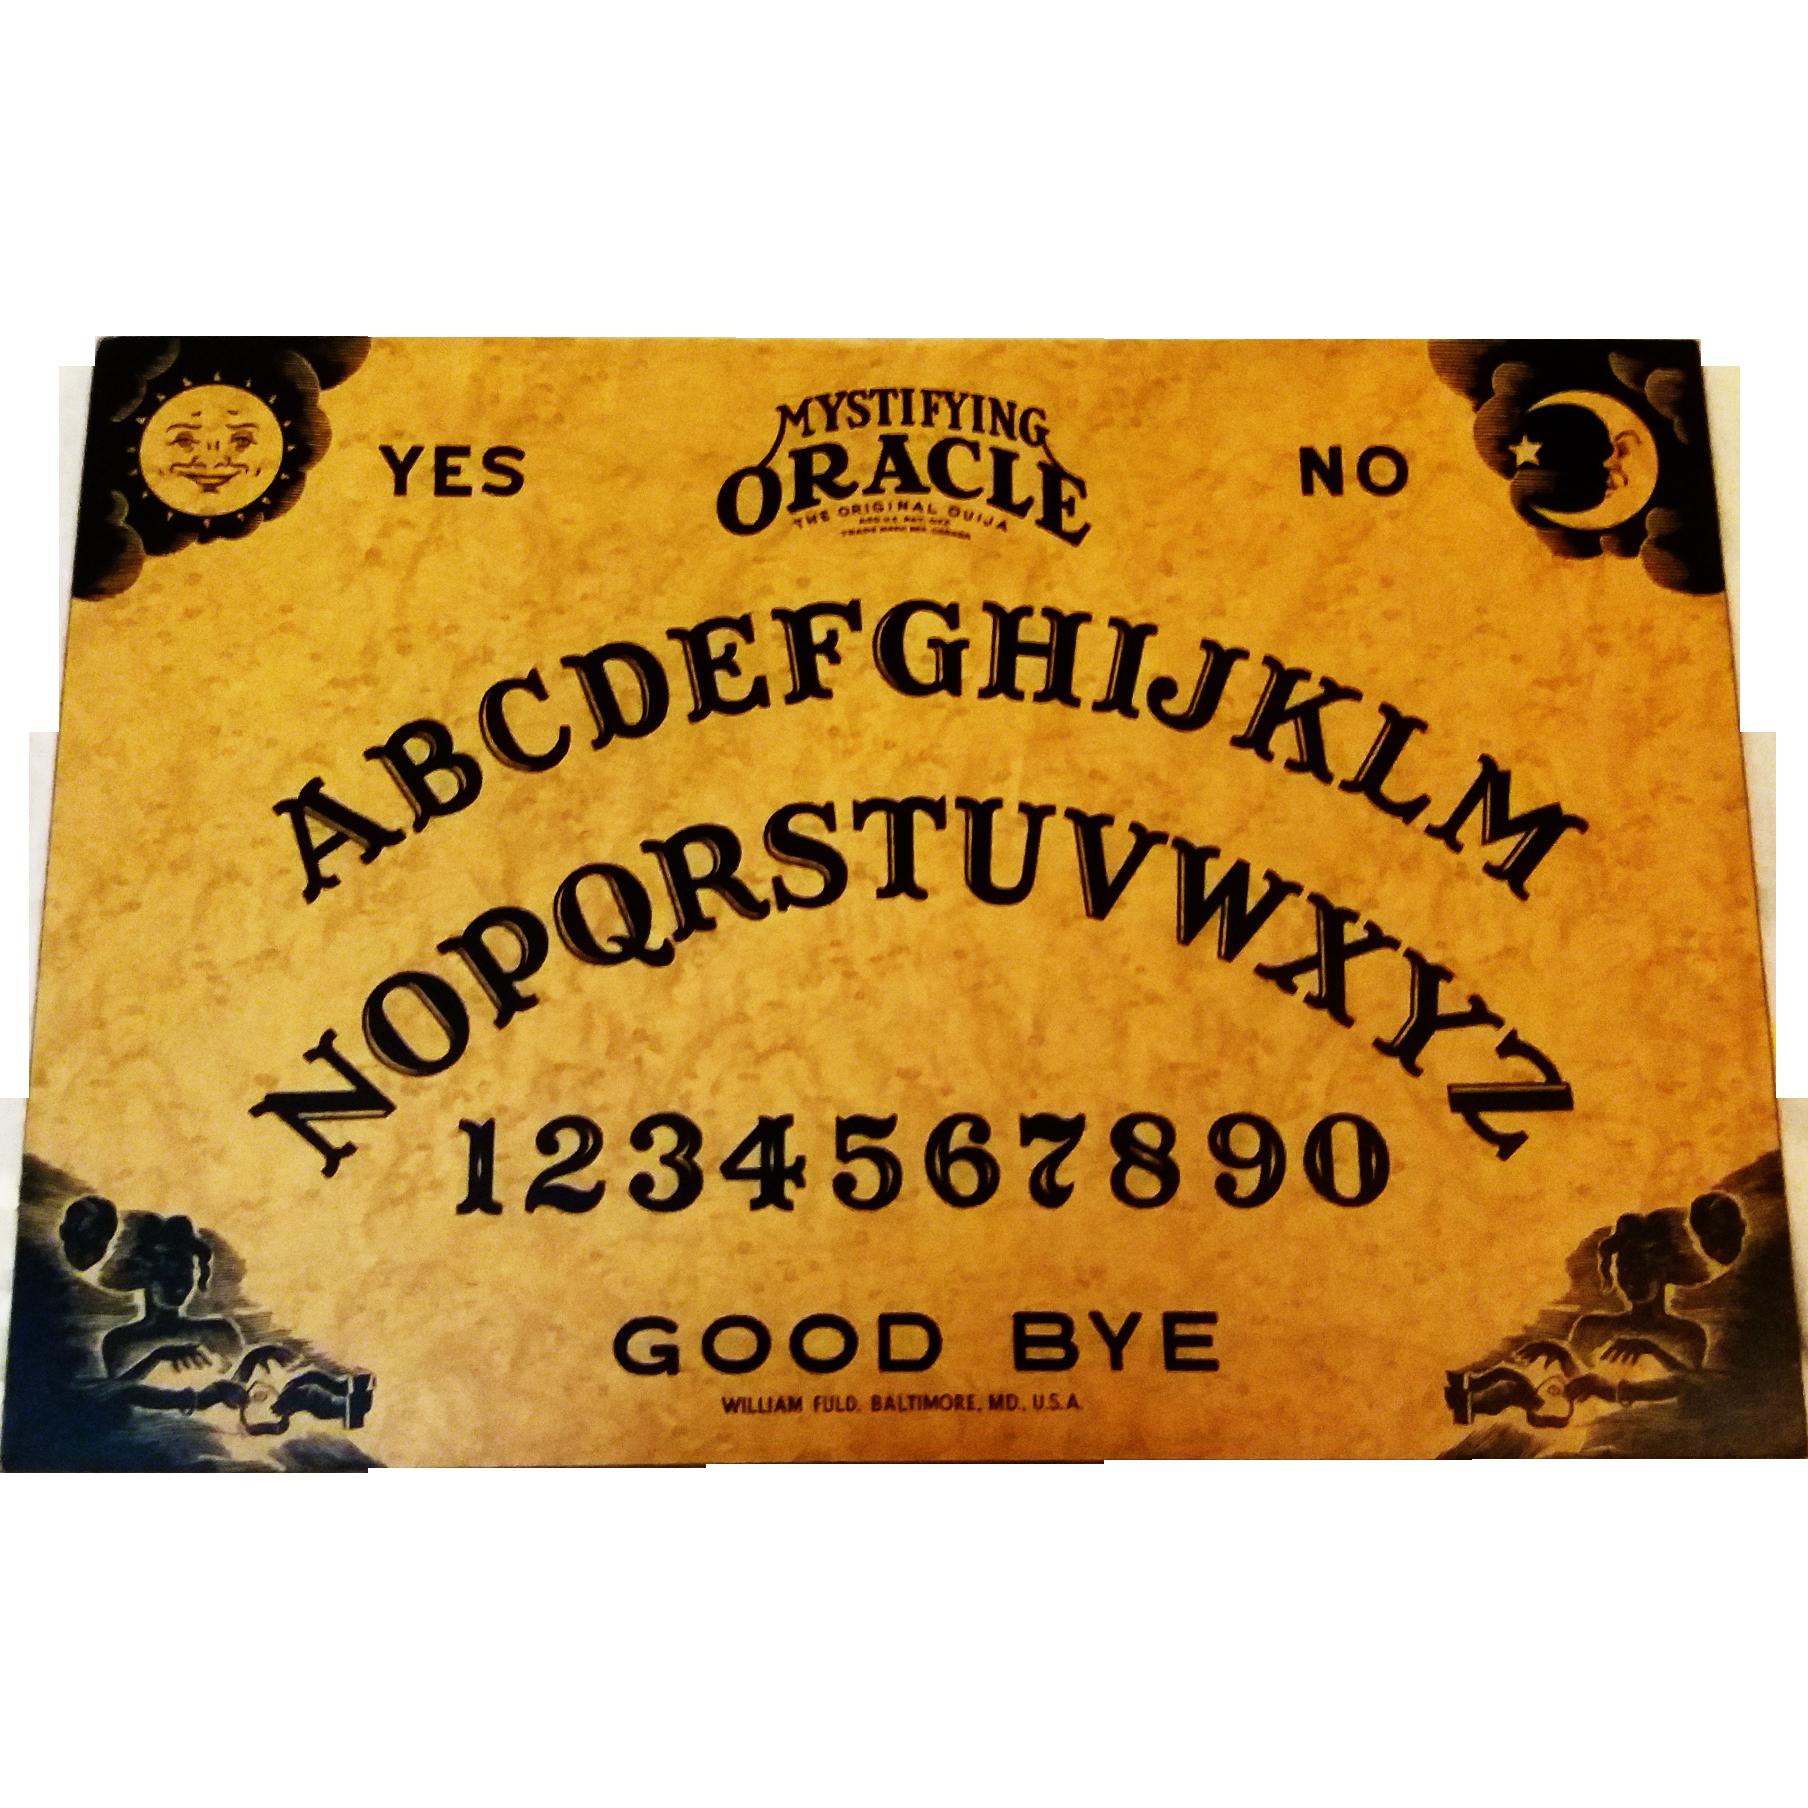 Vintage Ouija Board Game Circa 1938 Www Rubylane Com Vintagebeginshere Ouija Ouija Board Vintage Toys